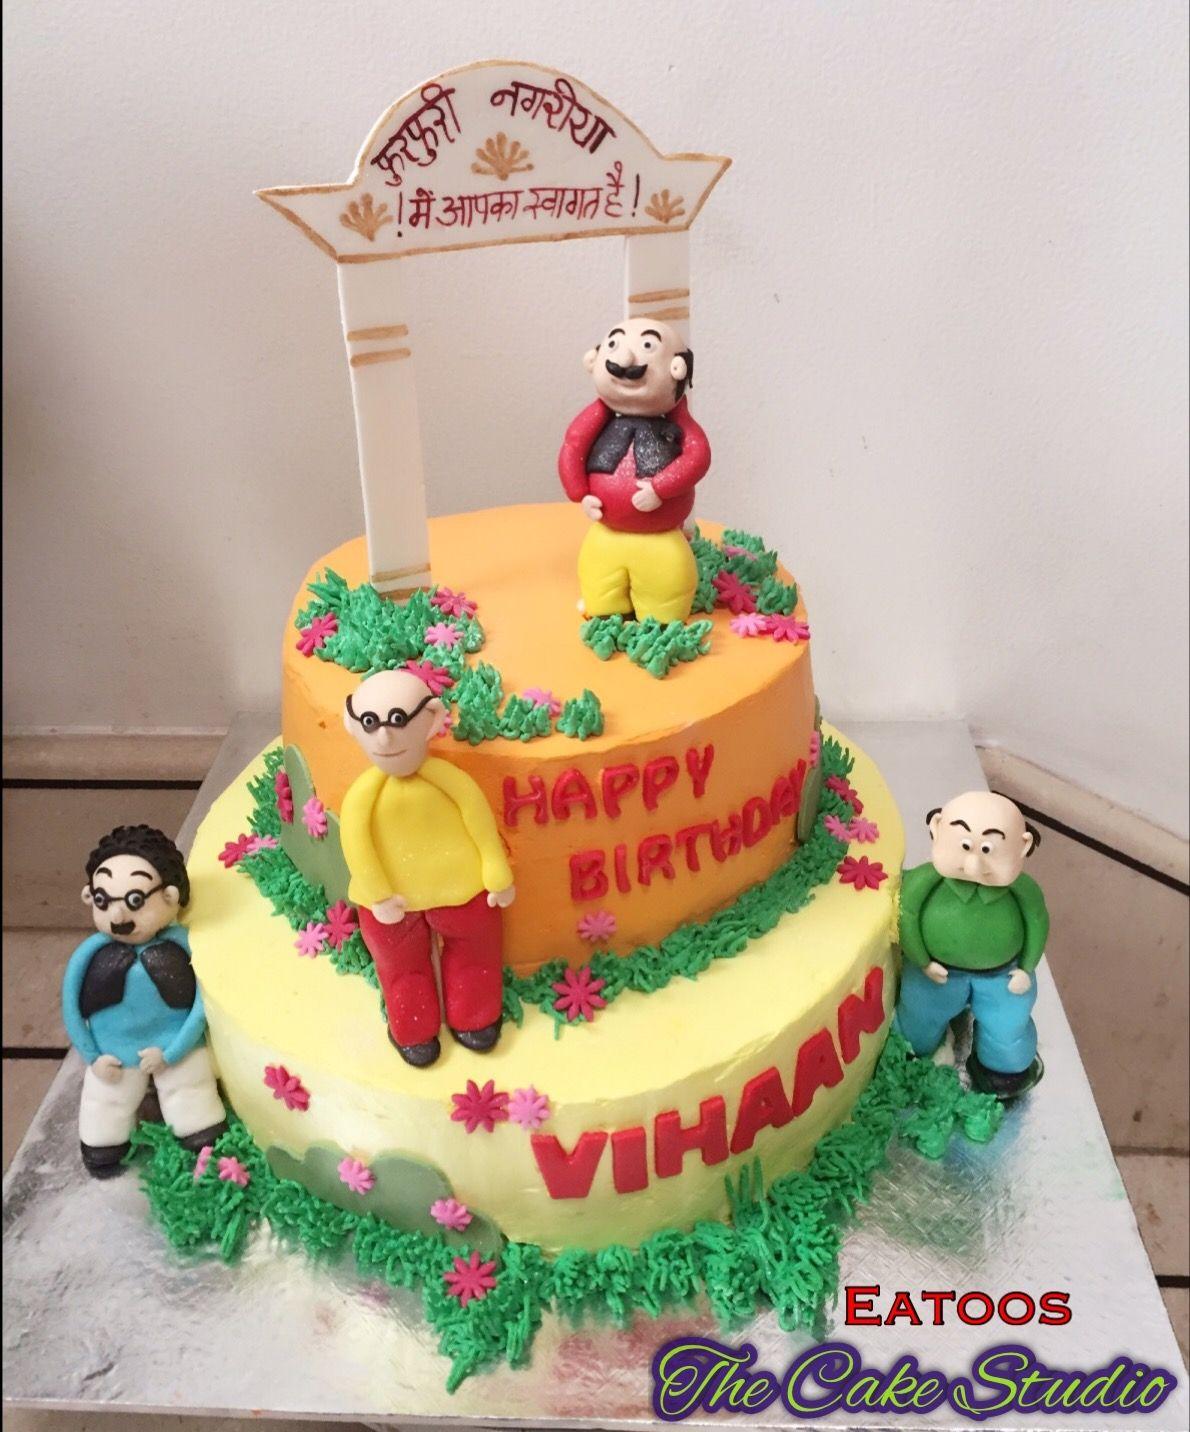 Motu Patlu Cake Eatoos The Cake Studio Pinterest Cake